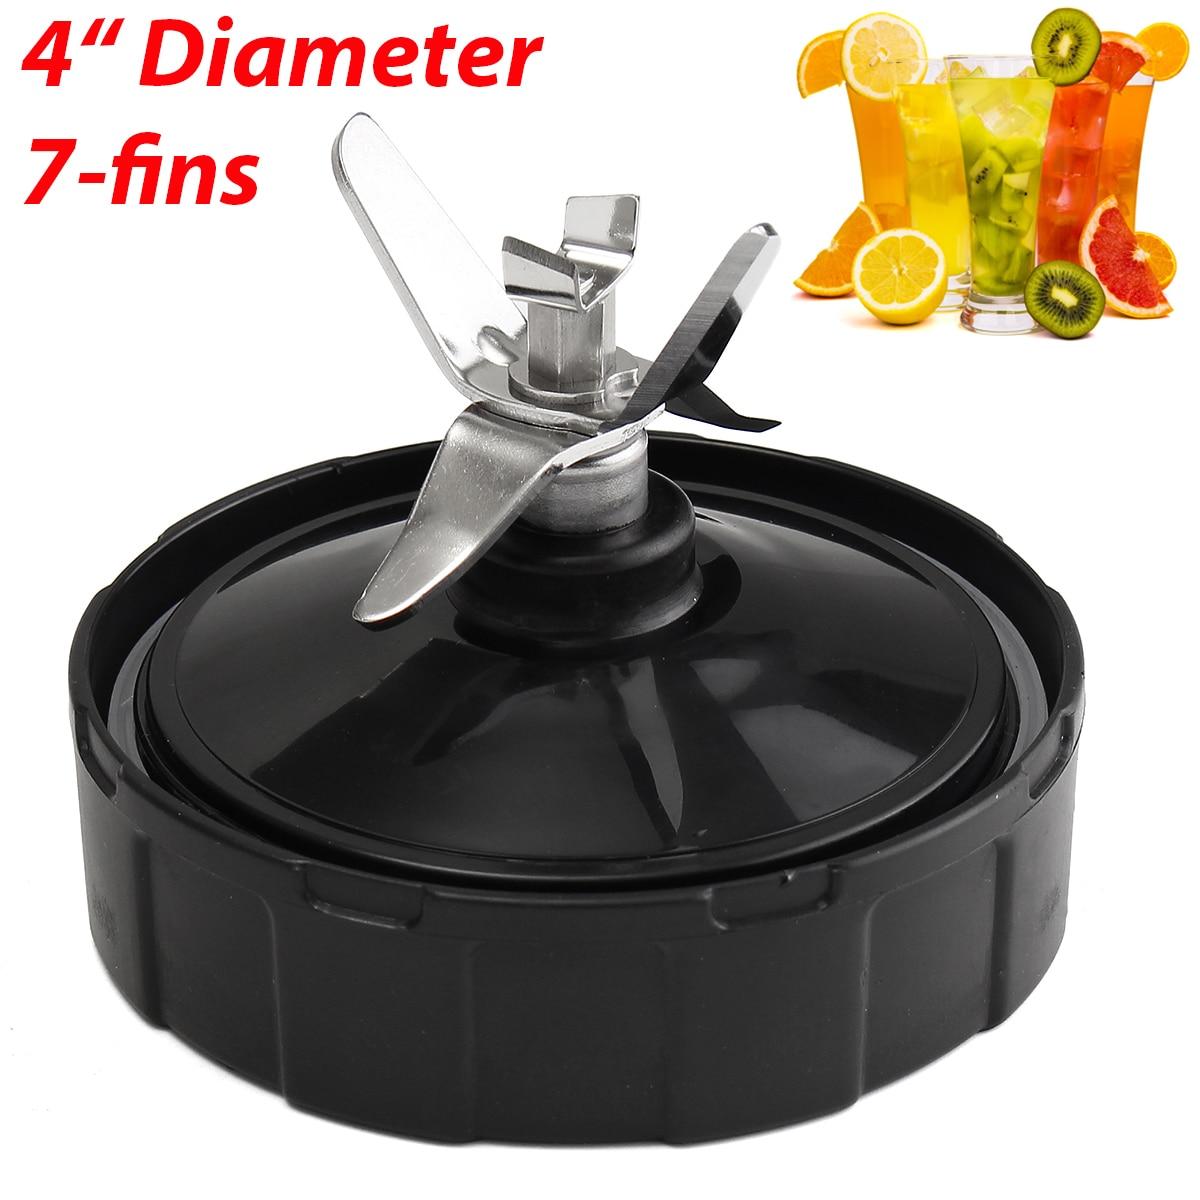 7 Fins Plastic Metal Extractor For Cross Blade Assembly Only For Nutri Ninja Blender 1000W Home Kitchen Appliance Blender Parts